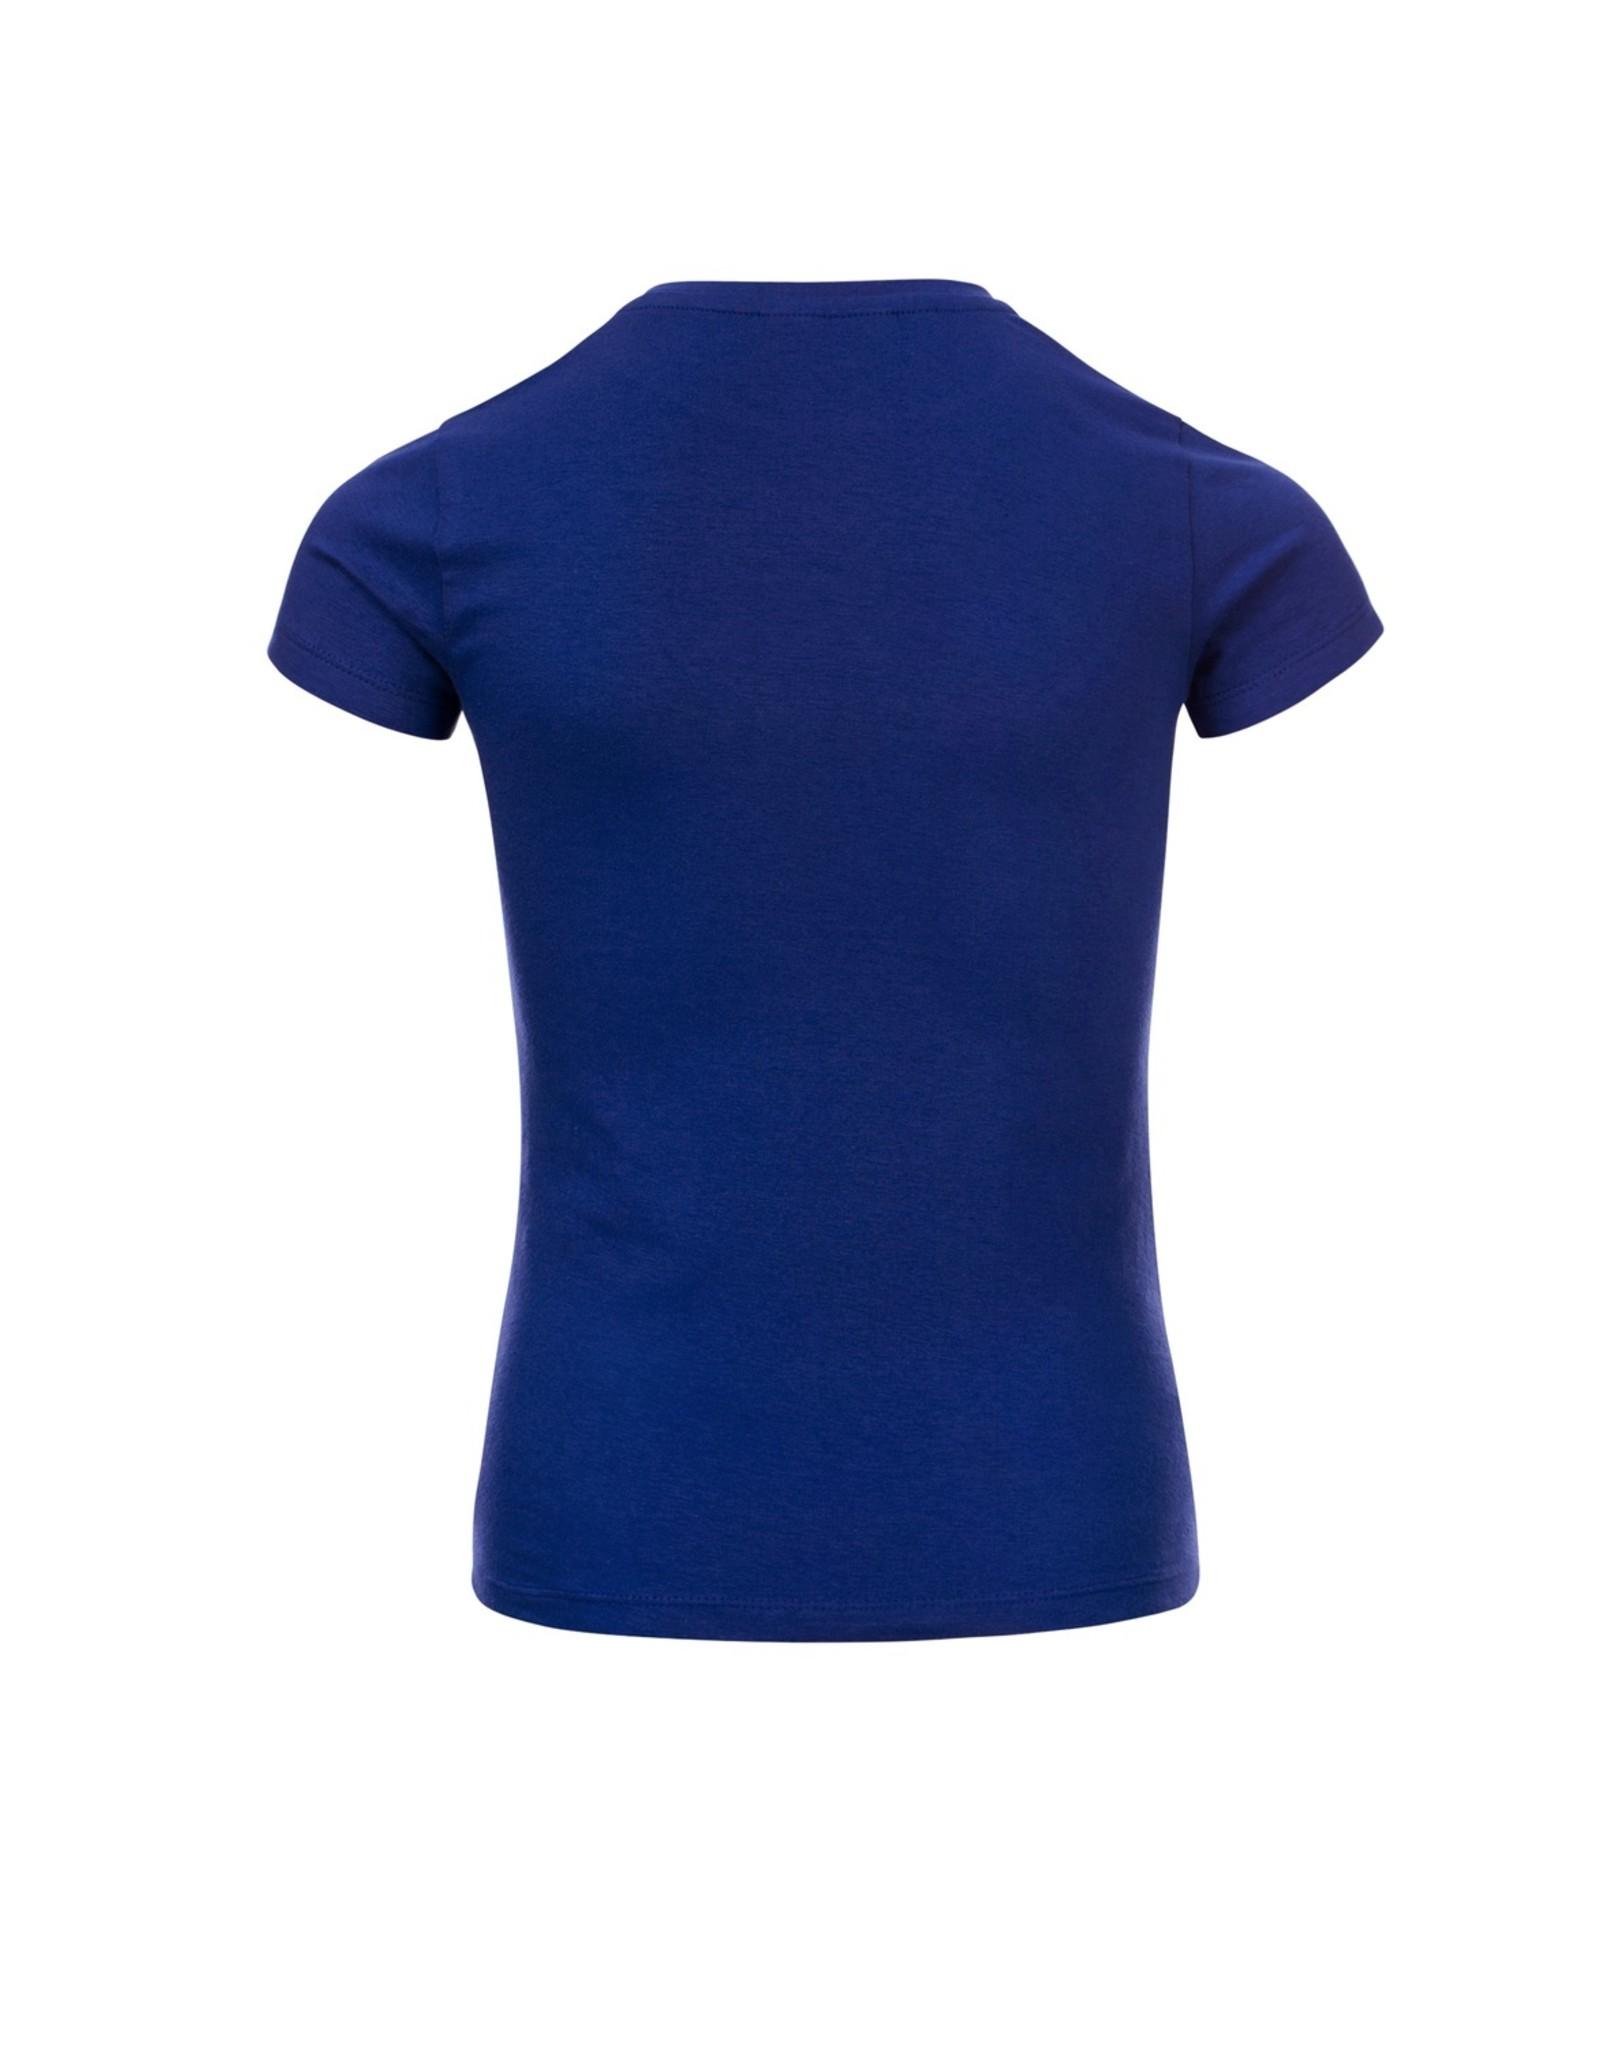 Looxs Revolution Girls T-shirt s/s lapis maat 164